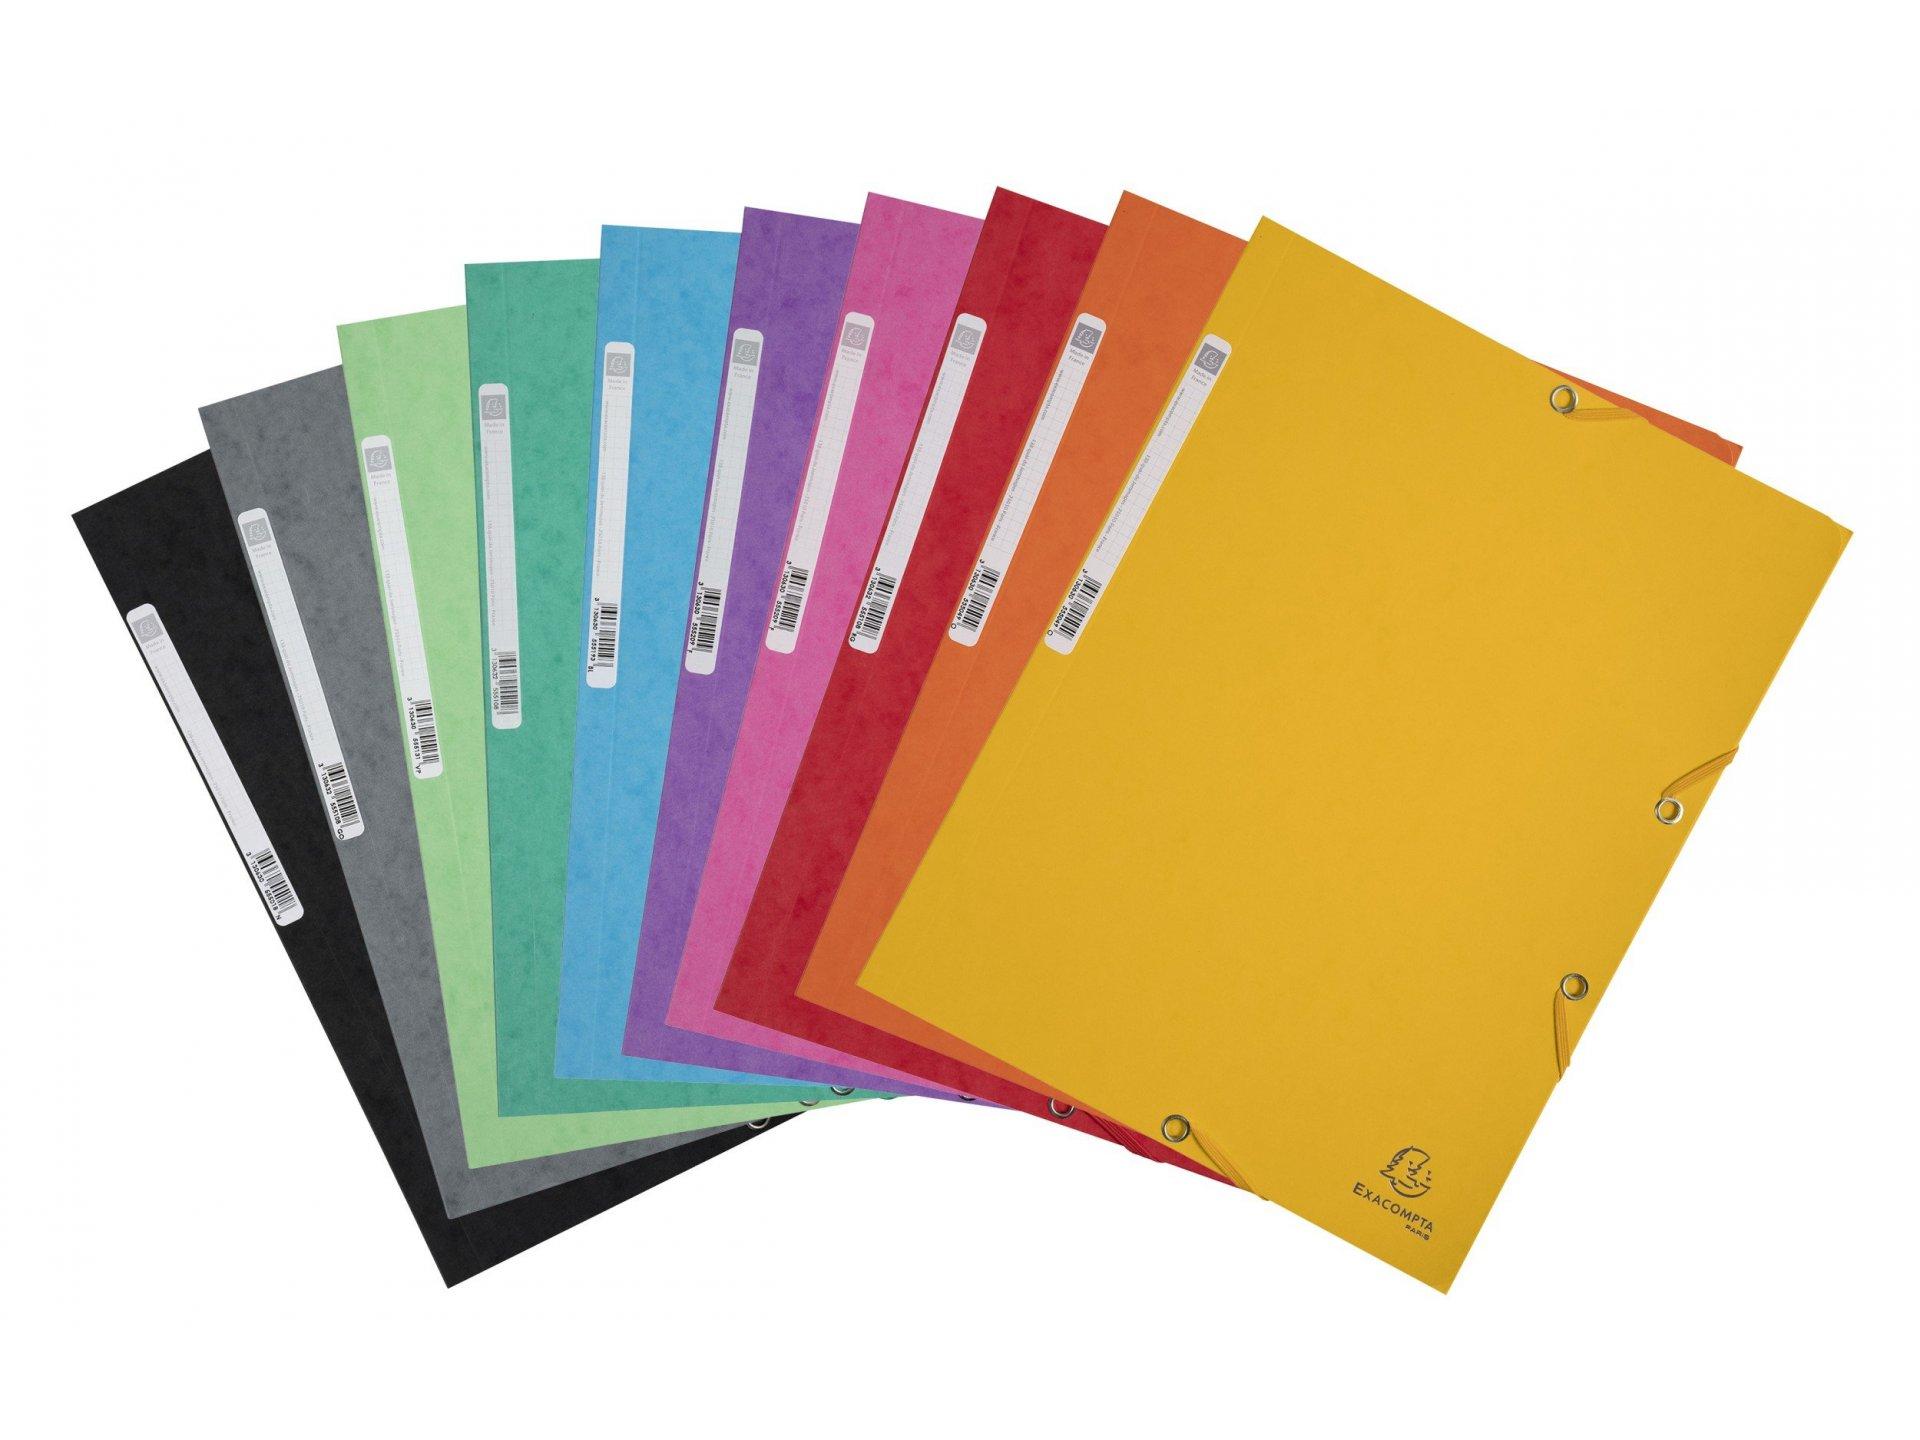 exacompta karton eckspannmappe online kaufen modulor. Black Bedroom Furniture Sets. Home Design Ideas